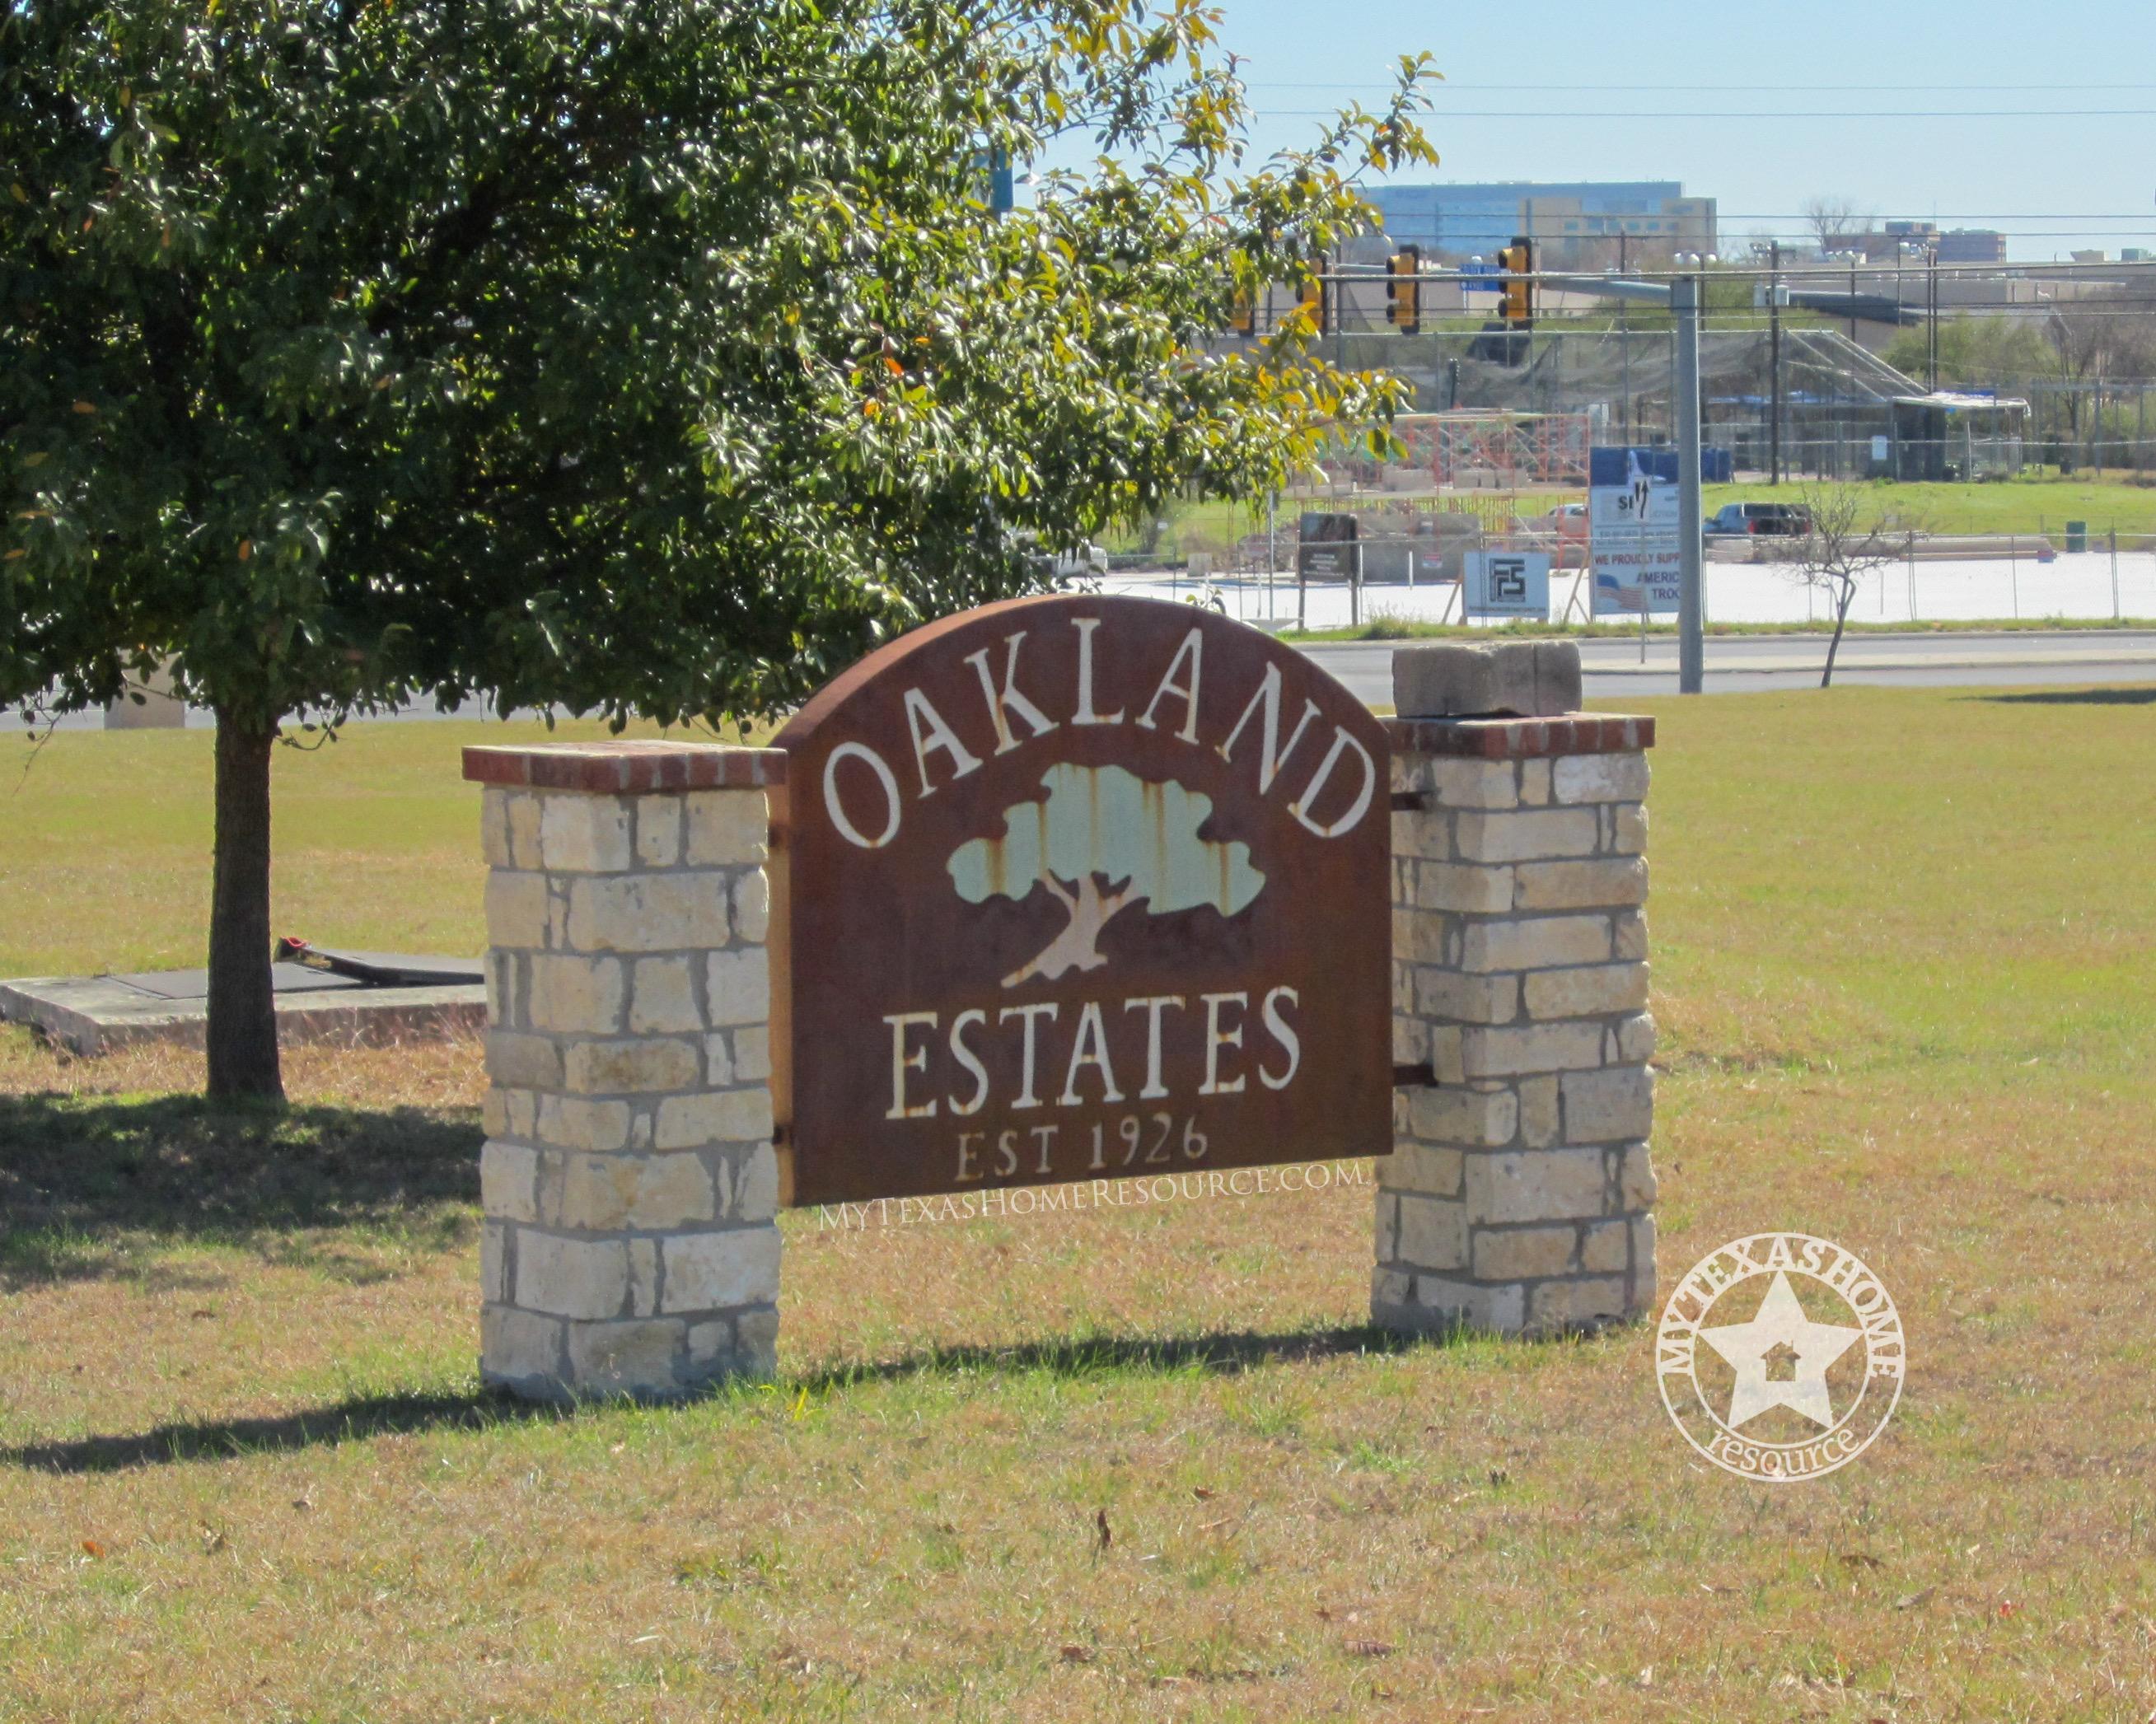 Oakland Estates Community San Antonio, TX